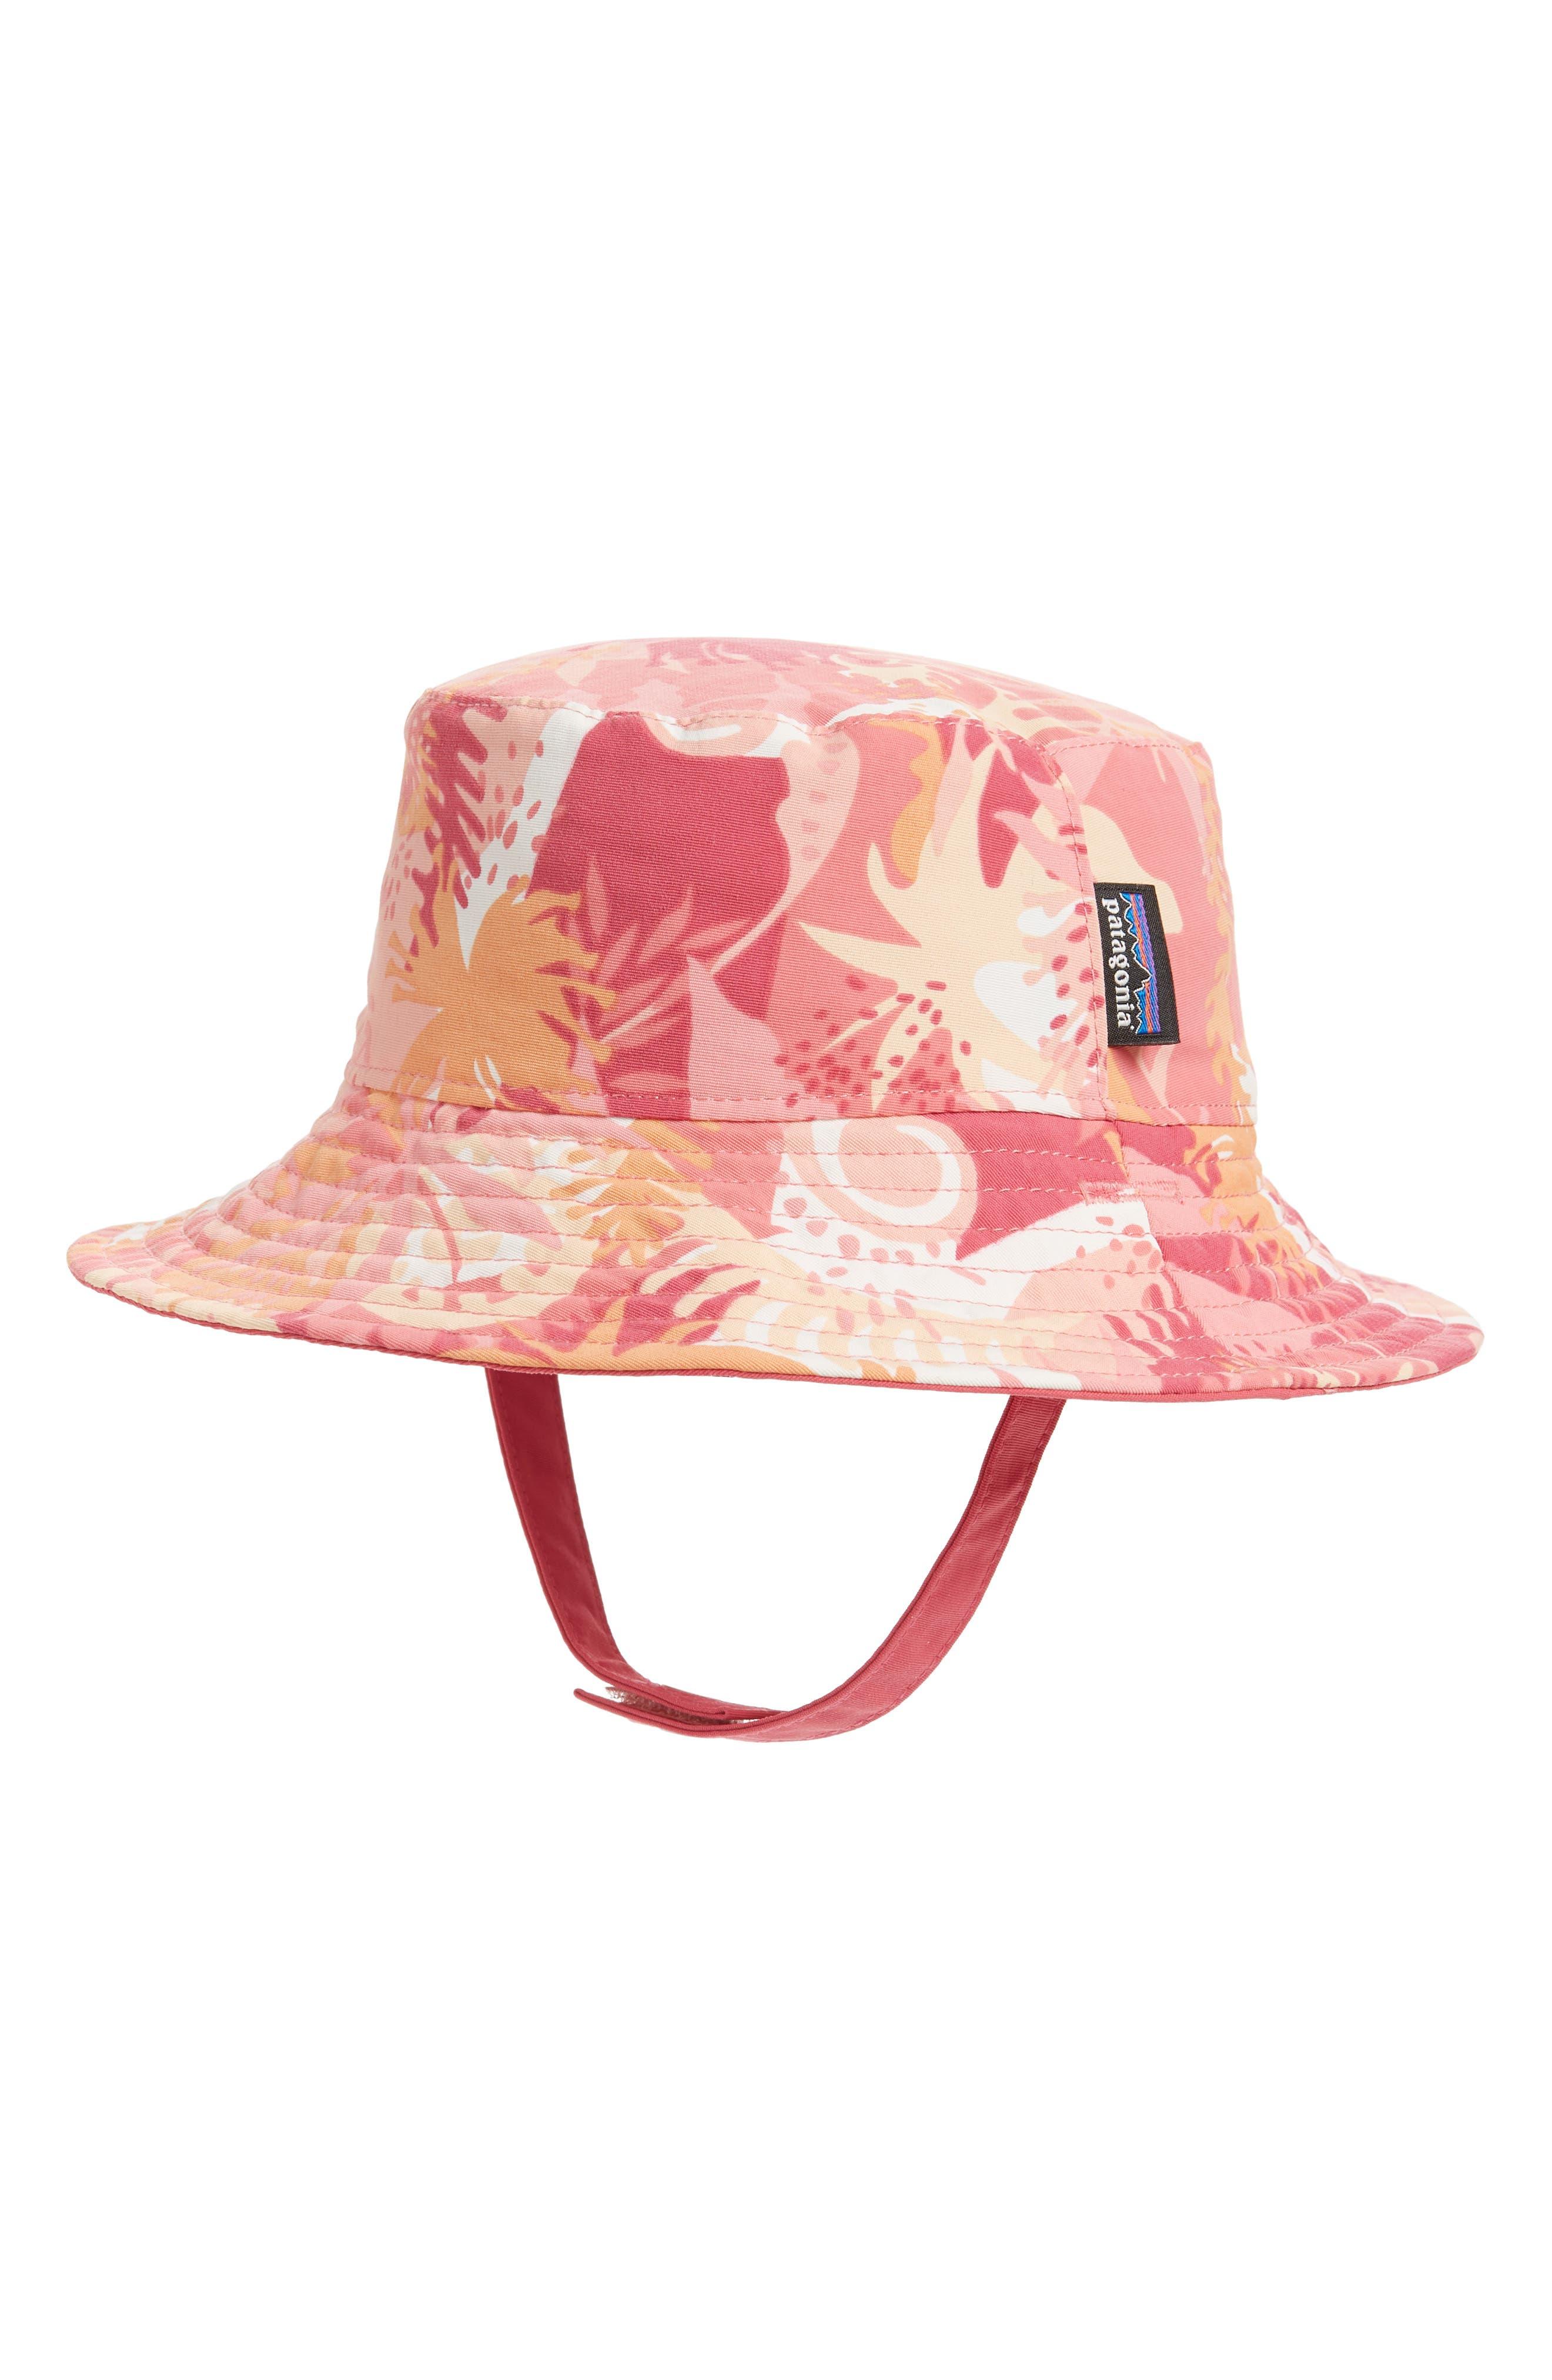 PATAGONIA Bucket Hat, Main, color, WILD WARATAH/ PETRA PINK